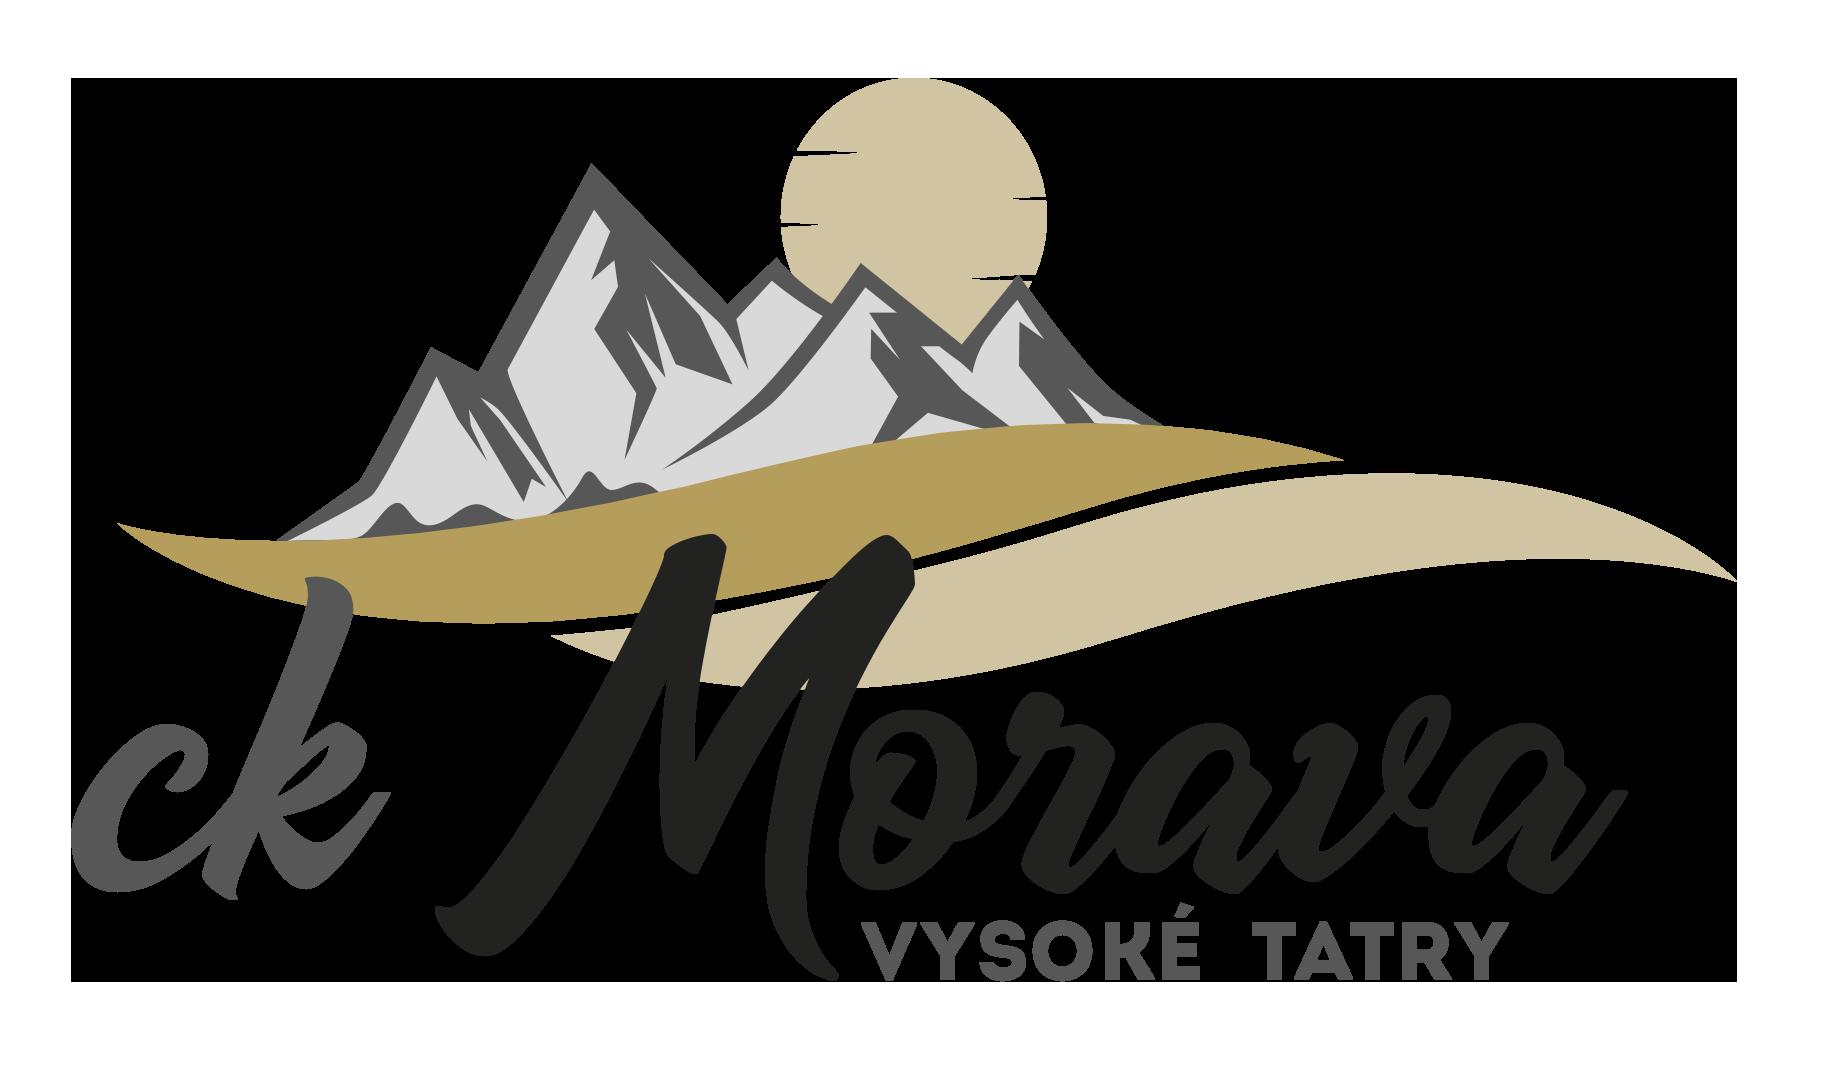 ck_Morava_logo.png